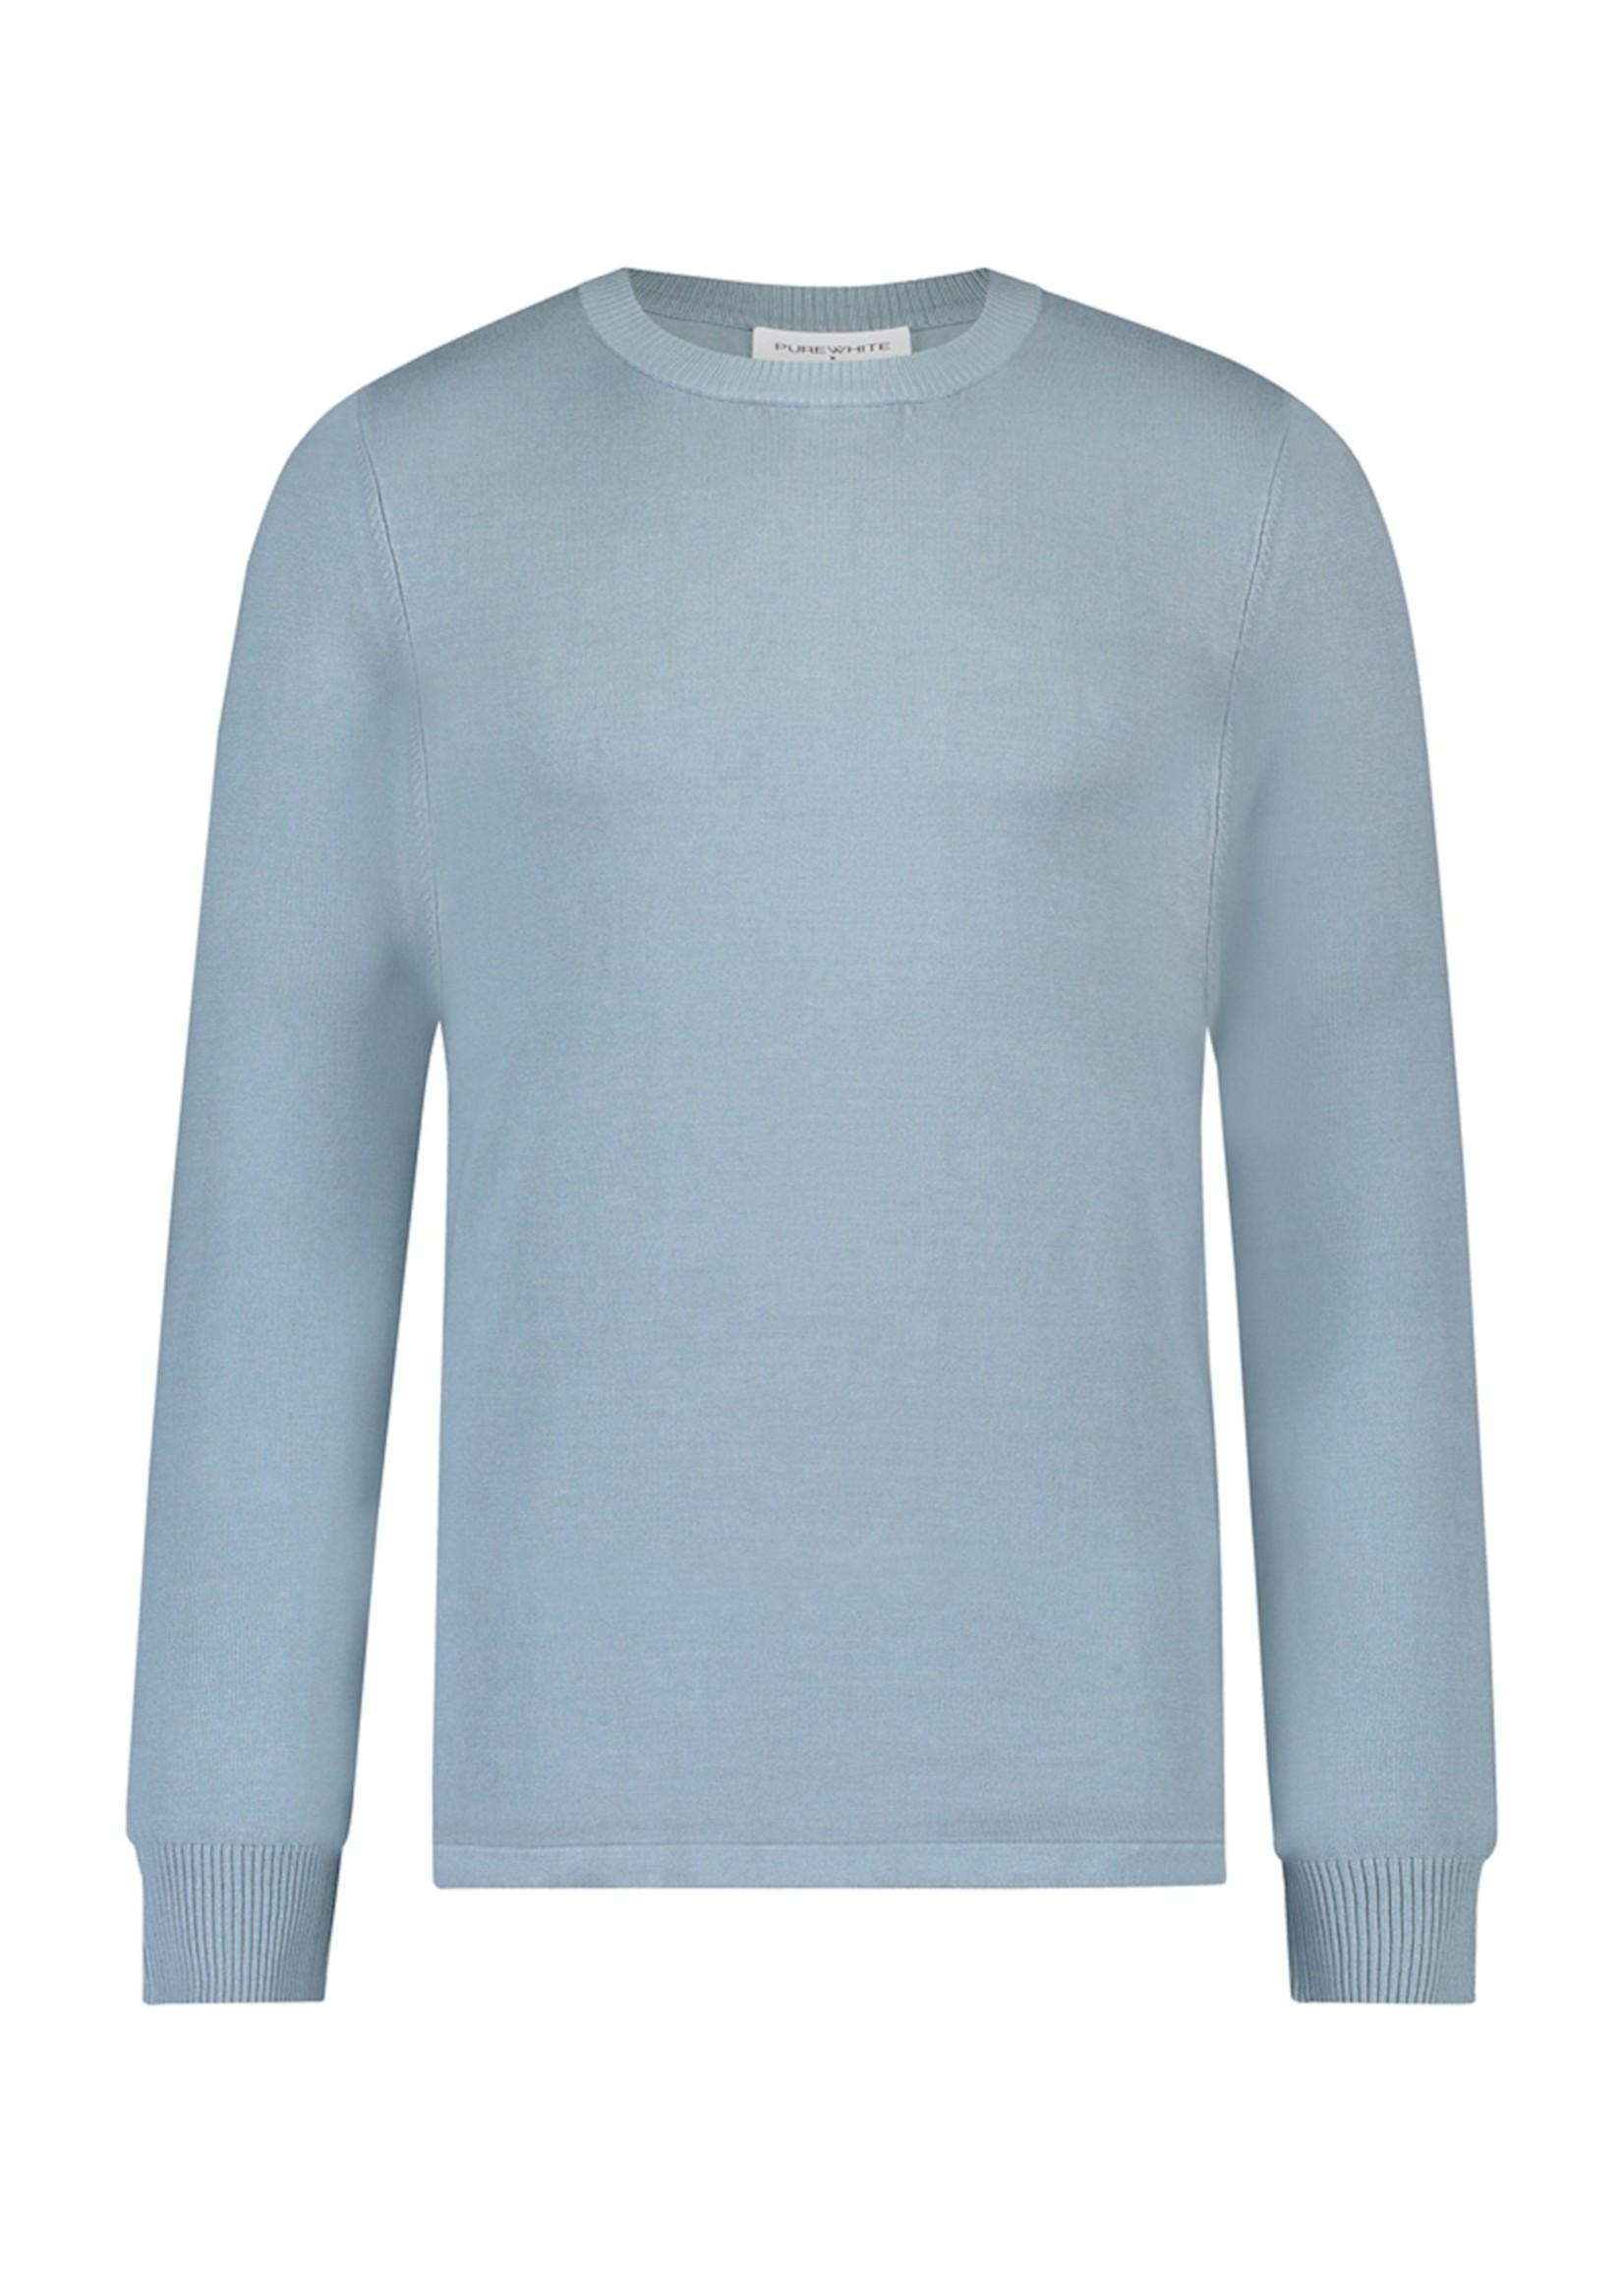 Purewhite Knitted Raglan Sweater - Light Blue